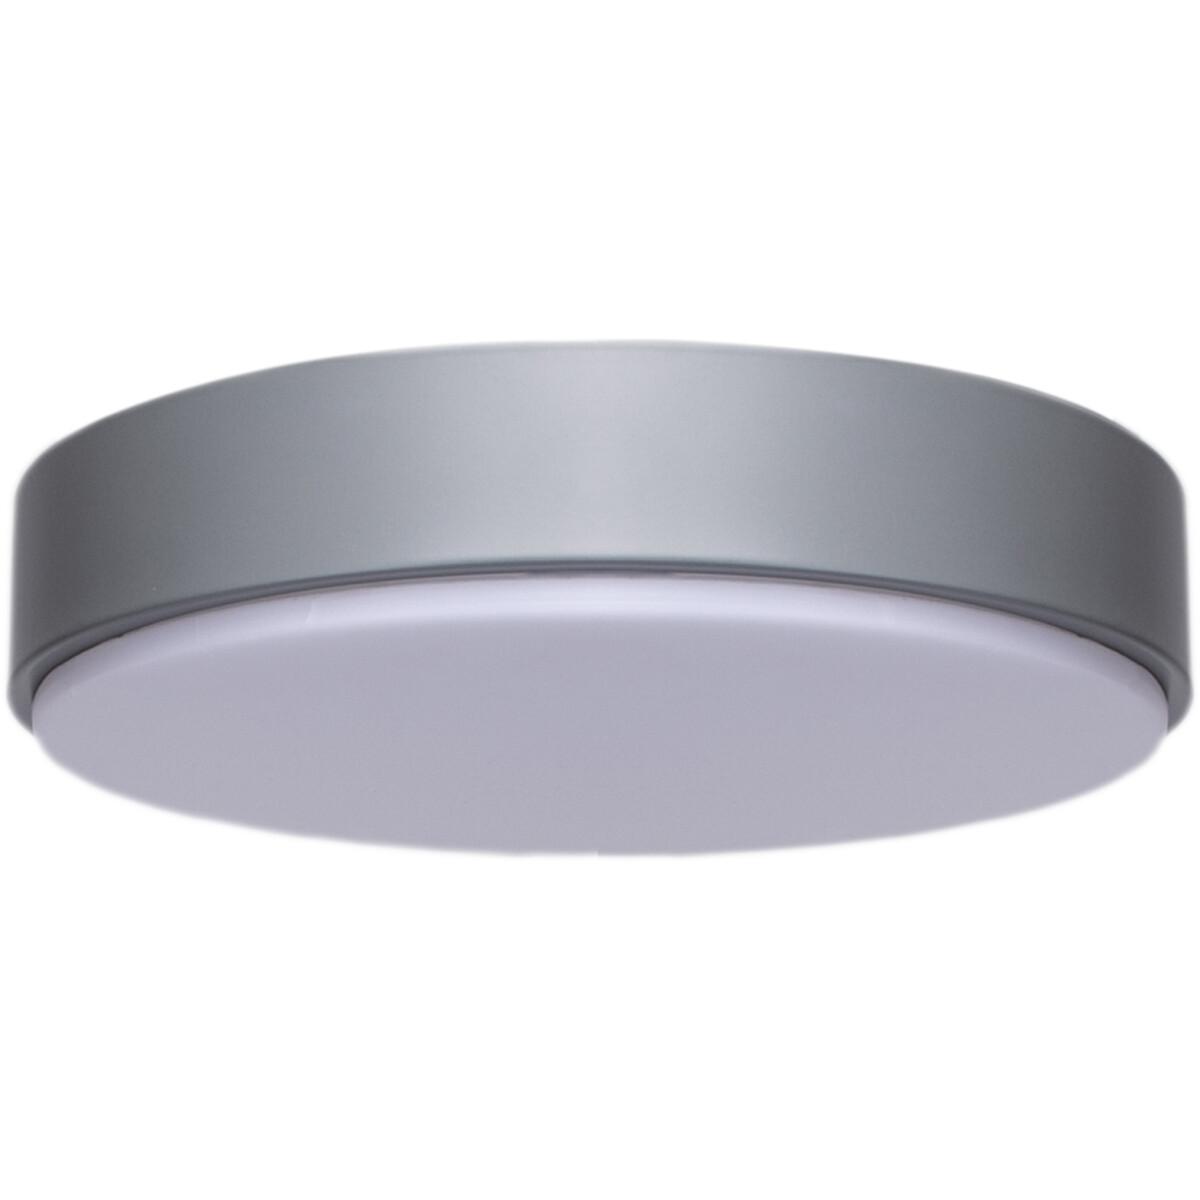 LED Plafondlamp - Aigi Santi - Opbouw Rond 20W - Natuurlijk Wit 4000K - Mat Grijs - Aluminium